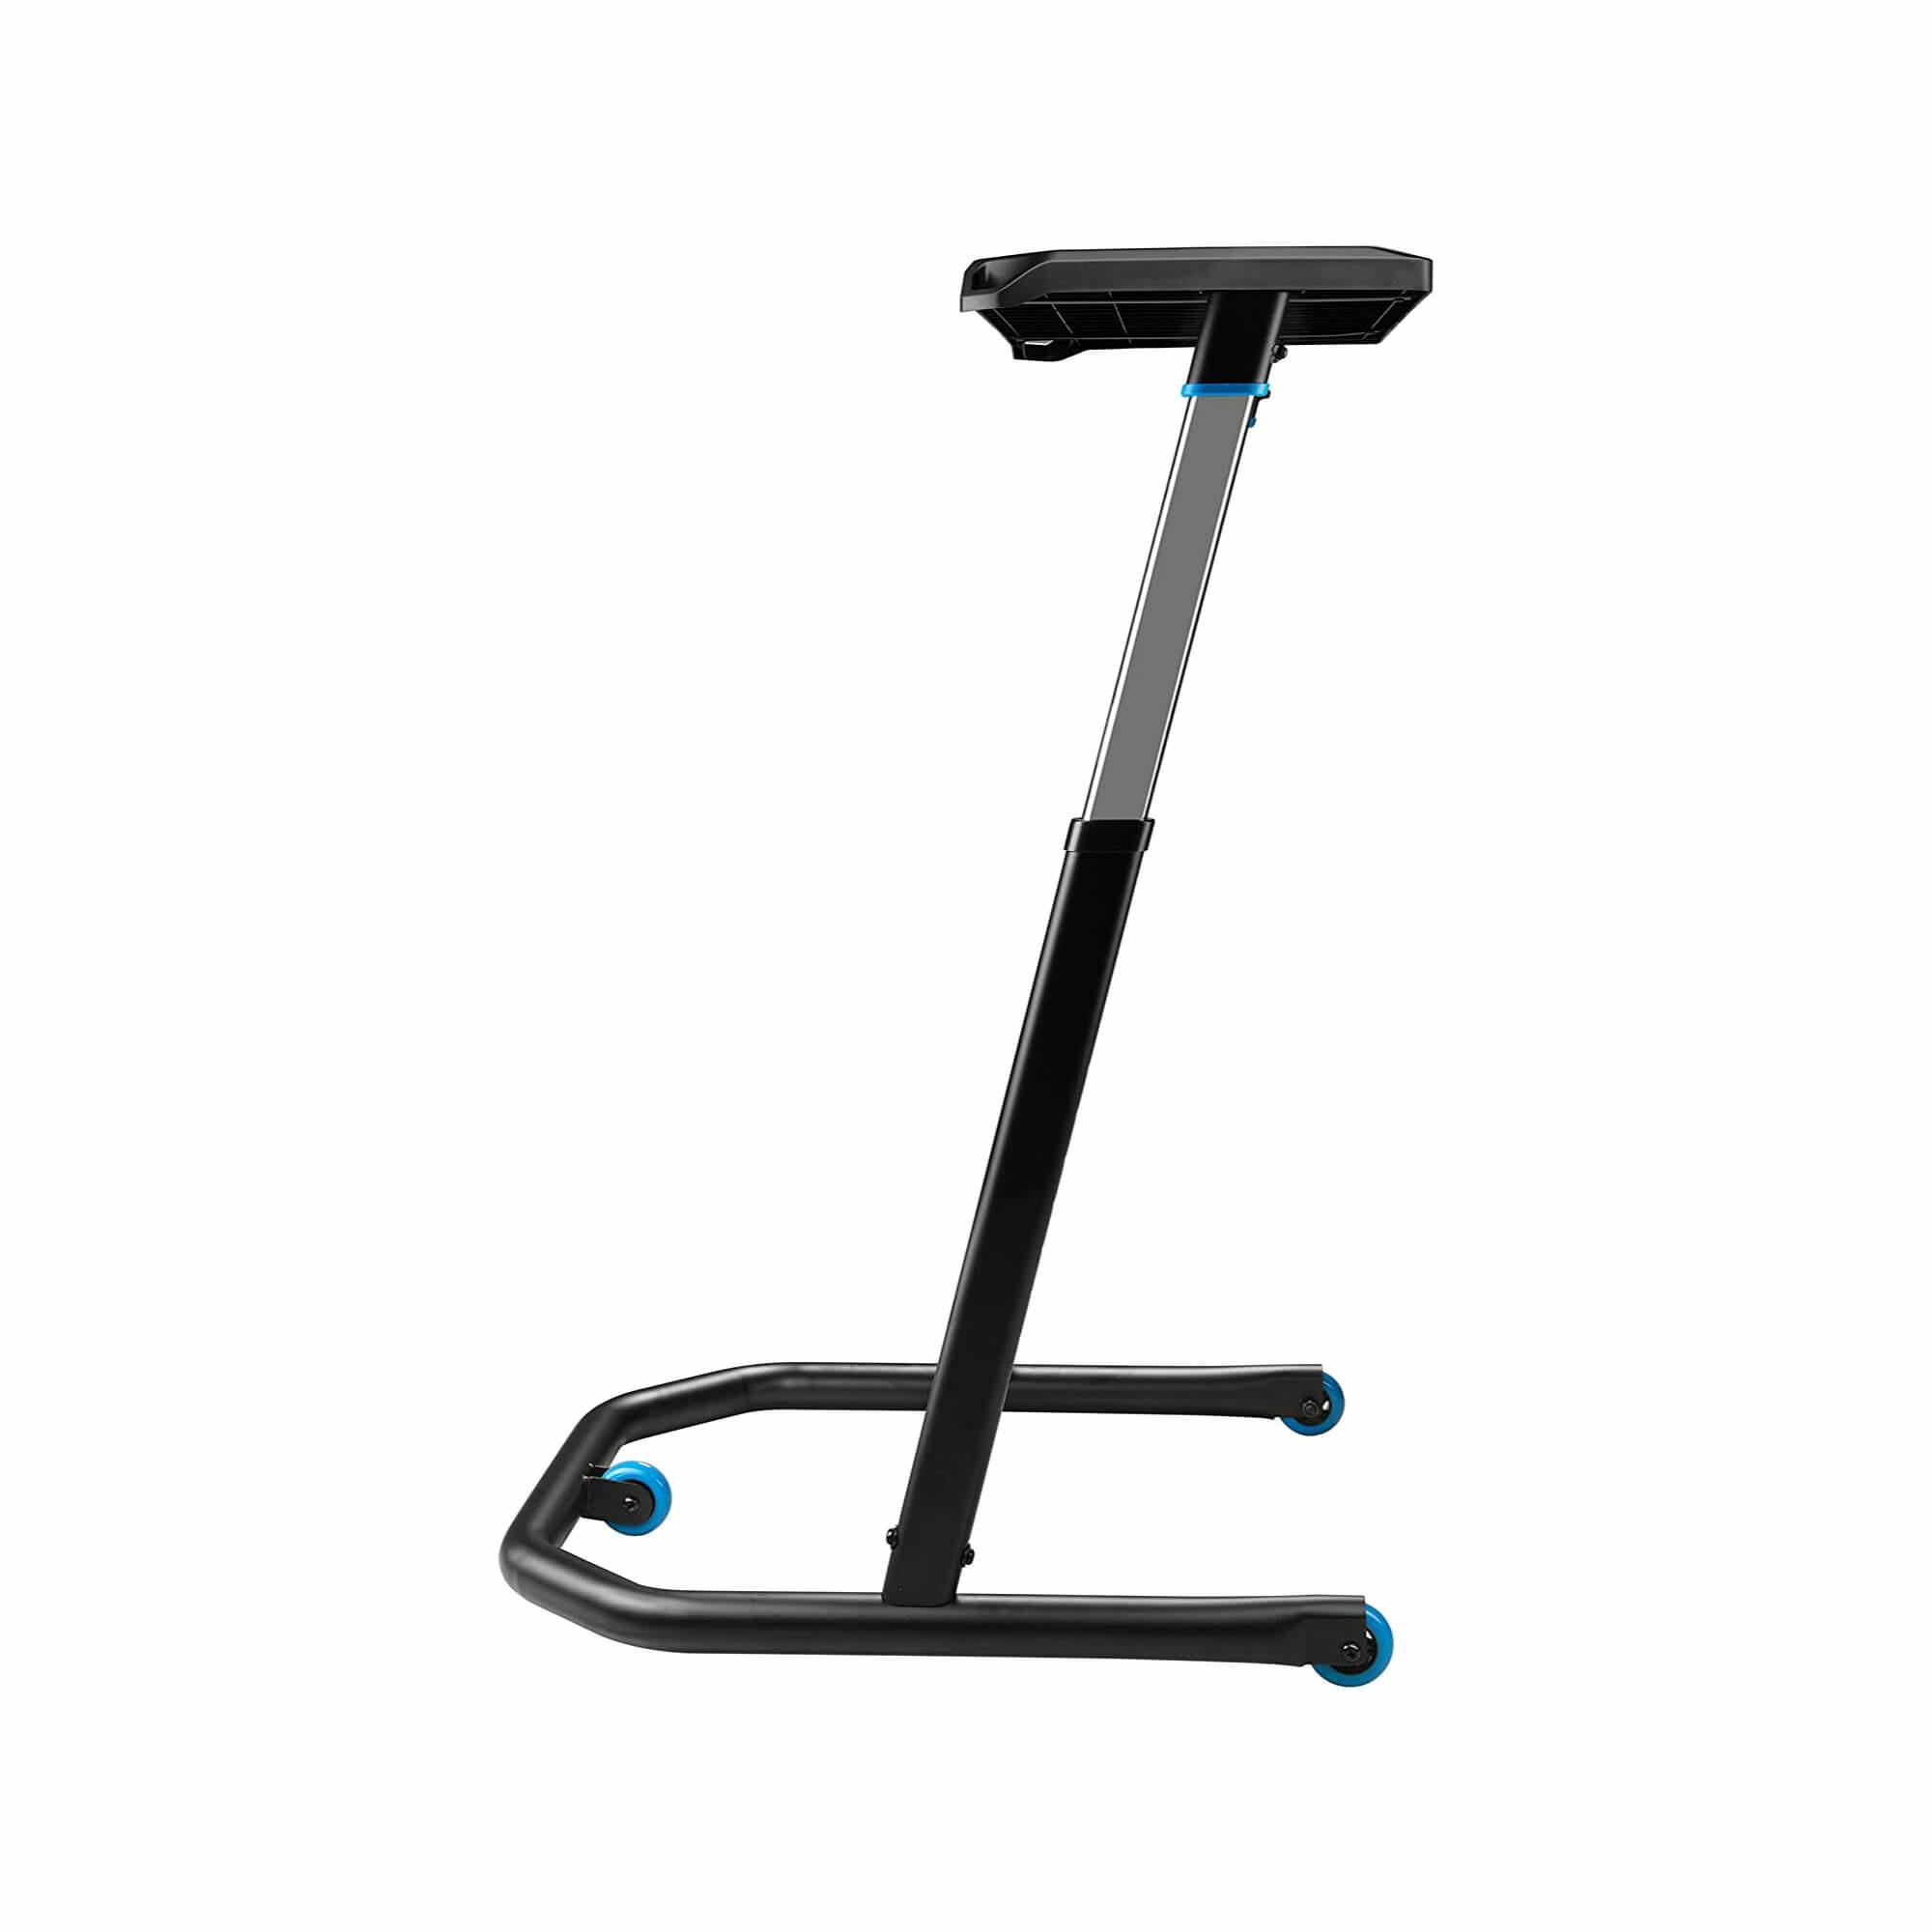 Kickr Fitness Desk-2